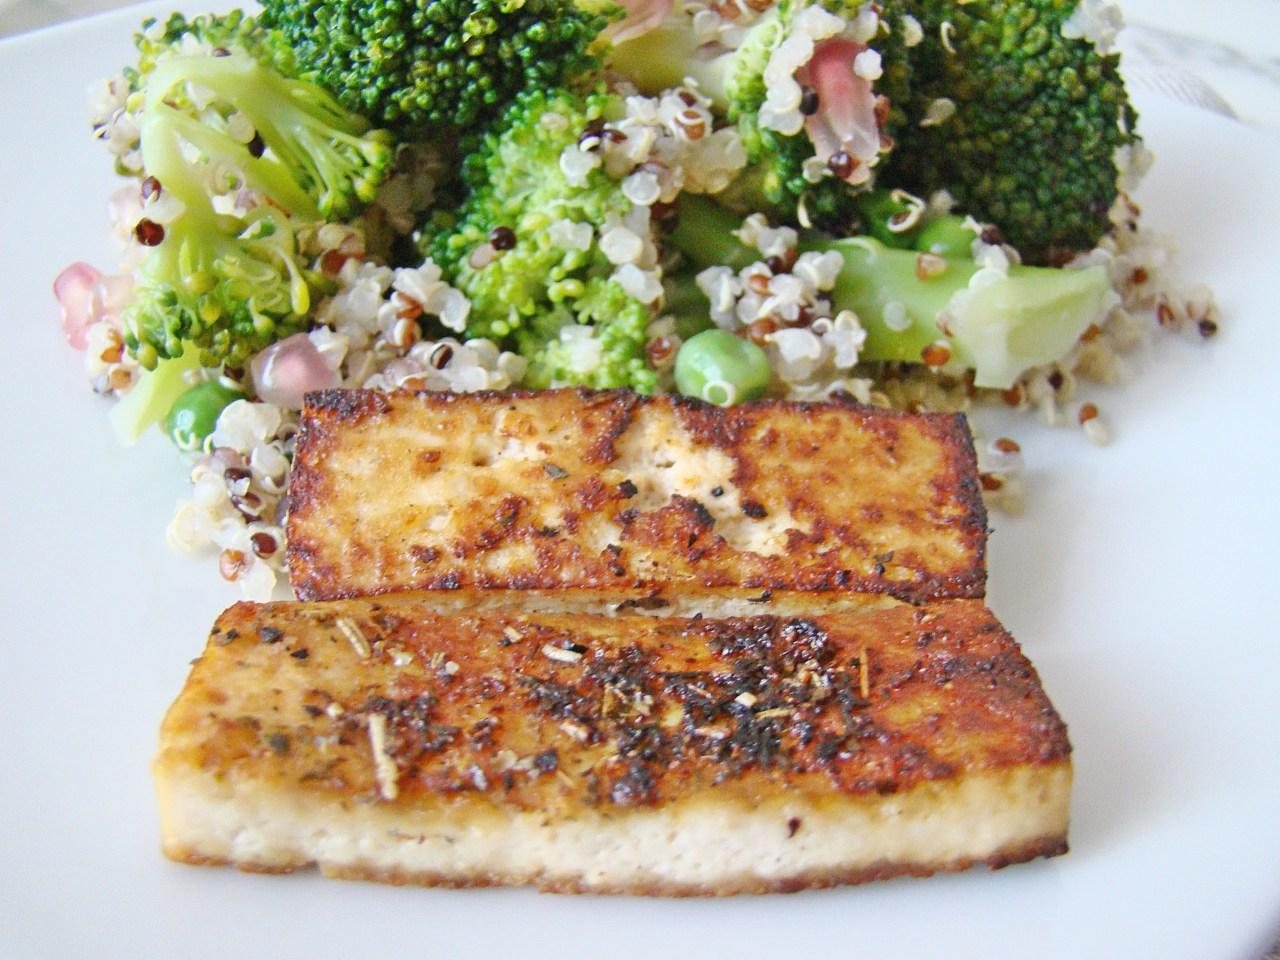 Quinoa Salad with Fried Tofu, Broccoli and Peas